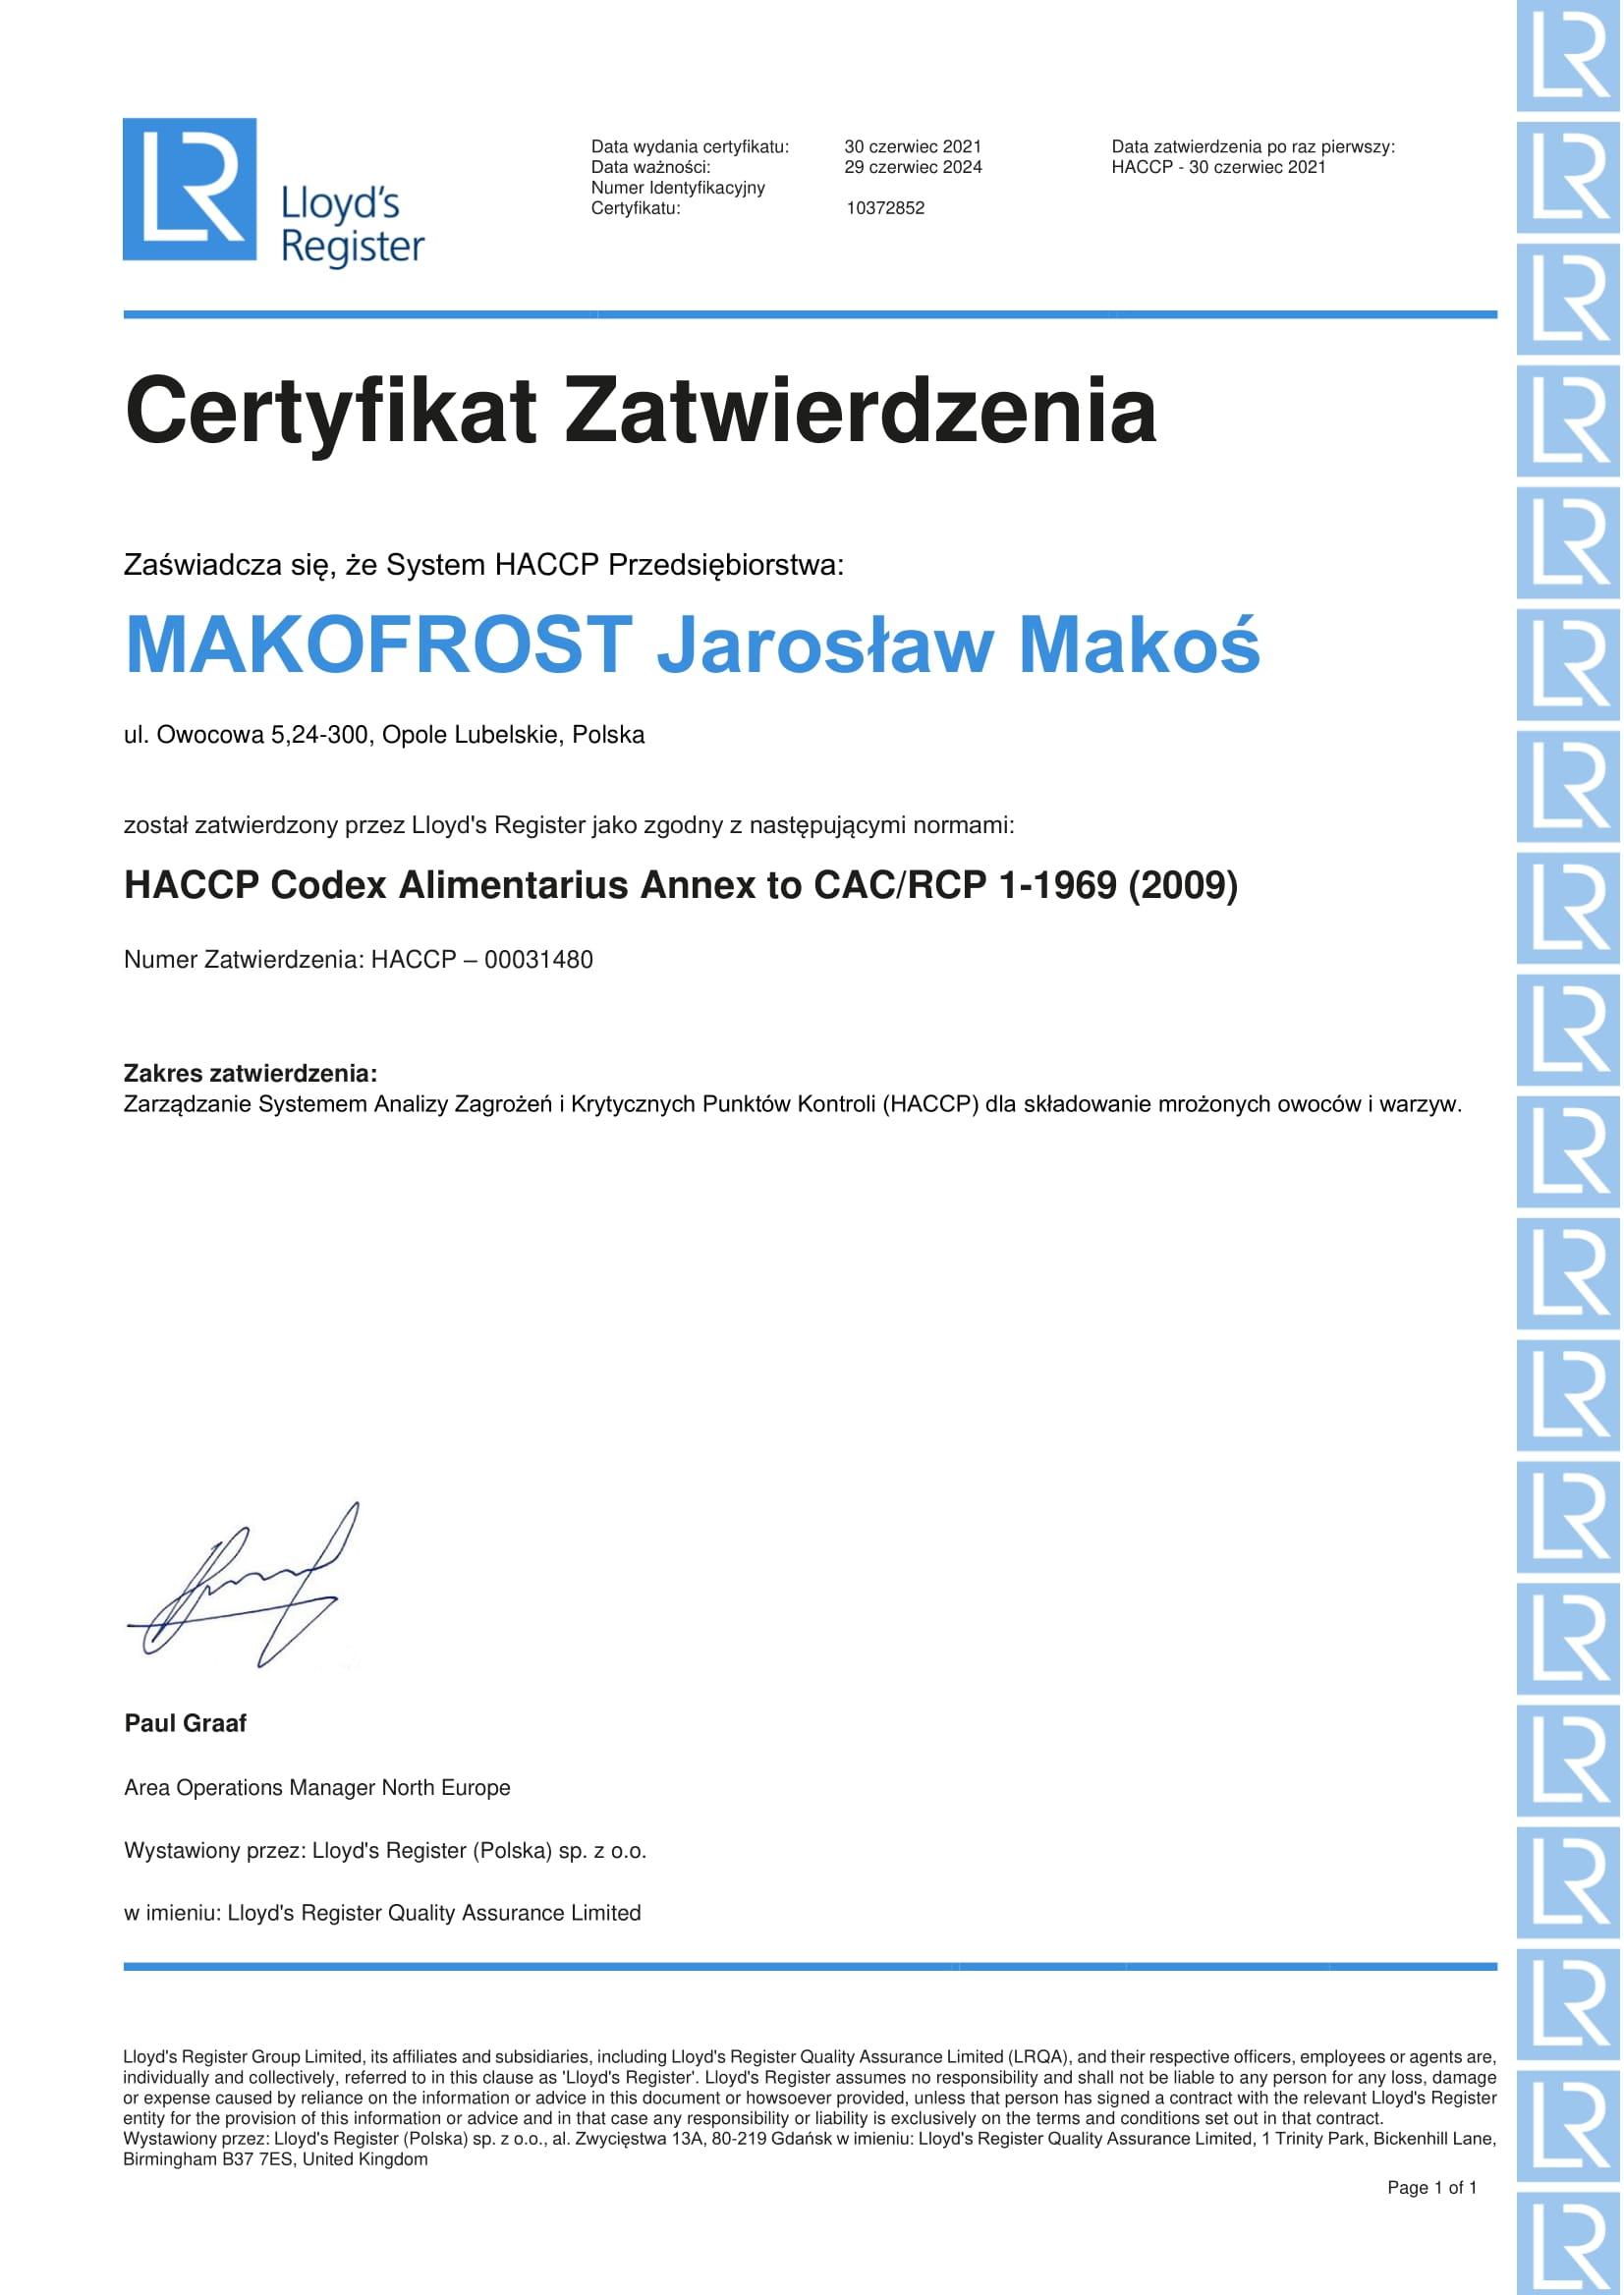 00031480-HACCP-POLPL-1